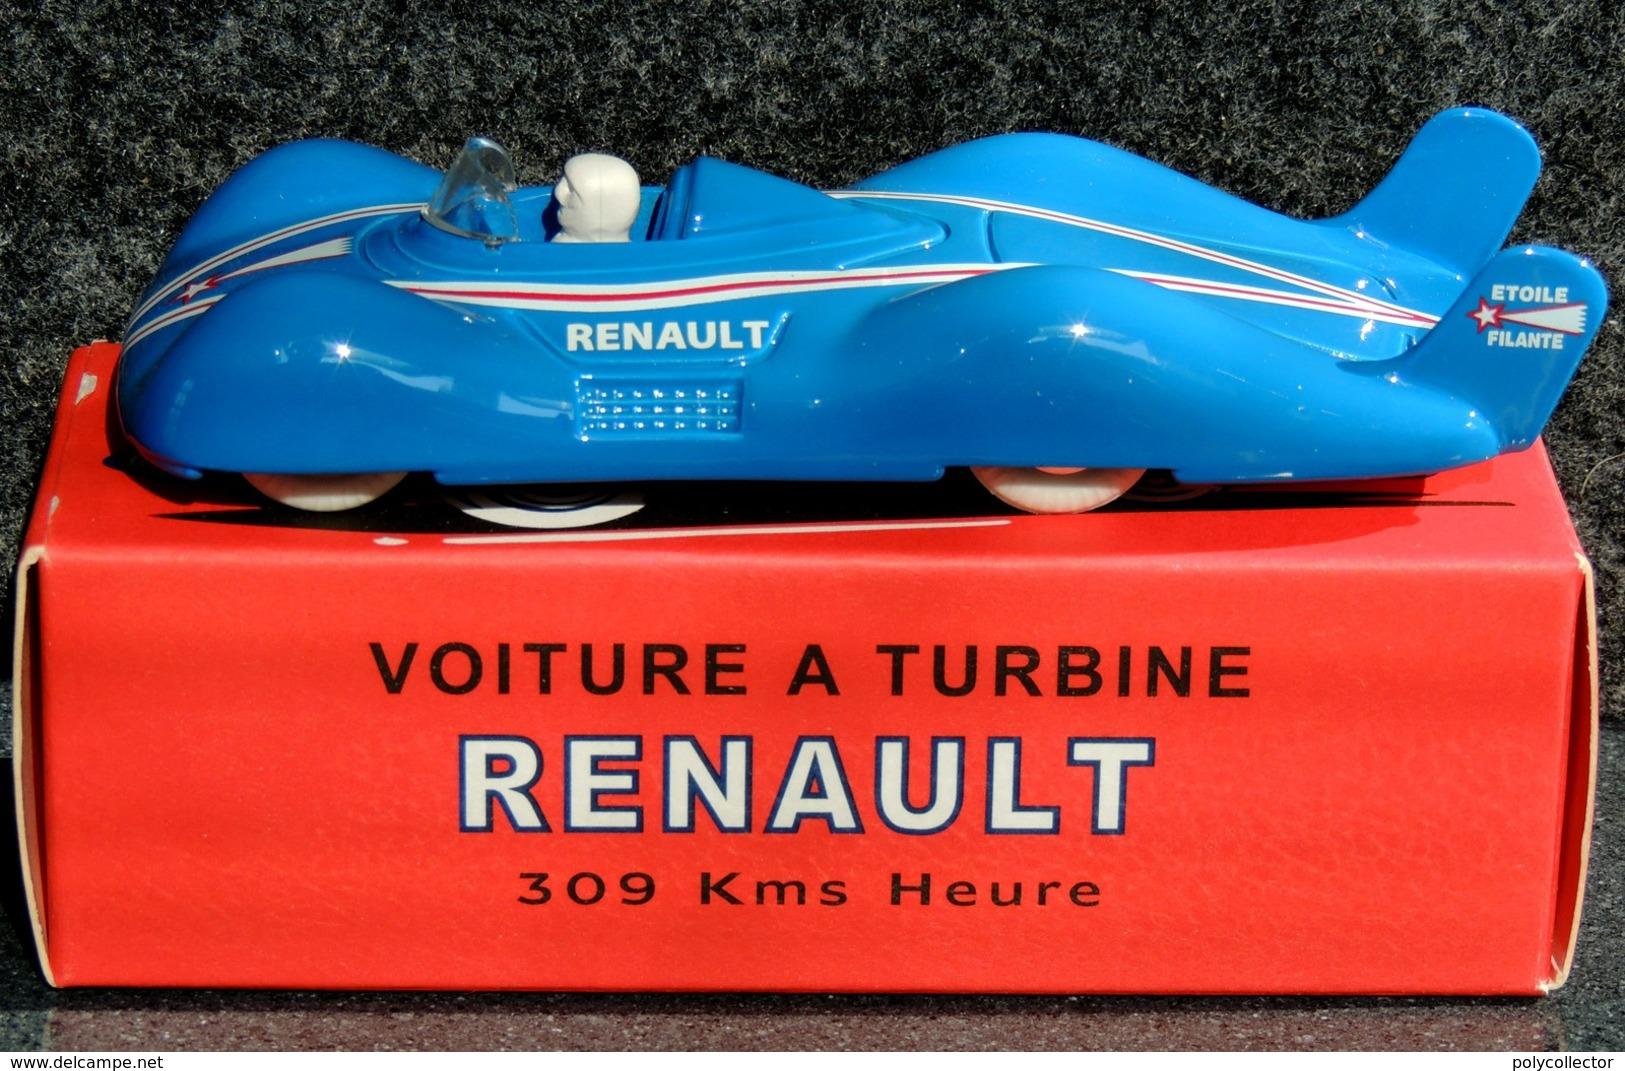 Renault Etoile Filante à Turbine ELIGOR 1/43 NEUF Boîte Carton - Voitures, Camions, Bus